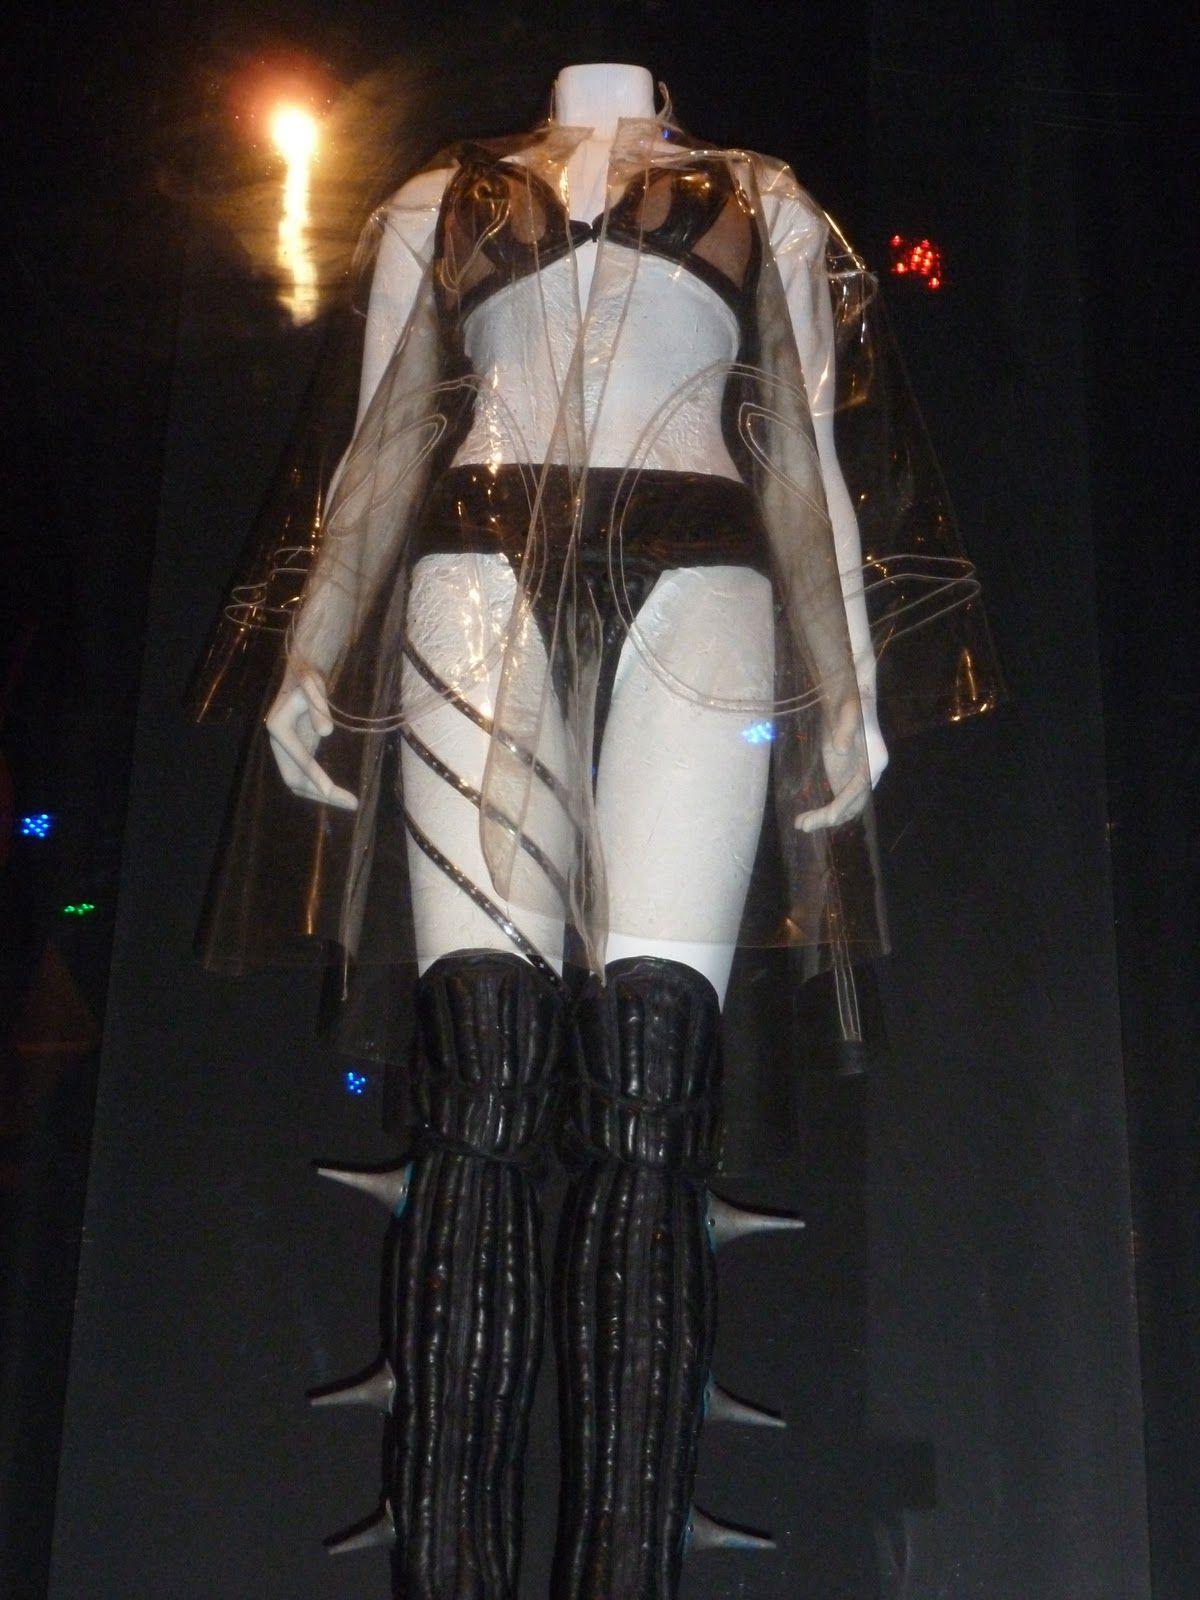 zhora blade runner costume